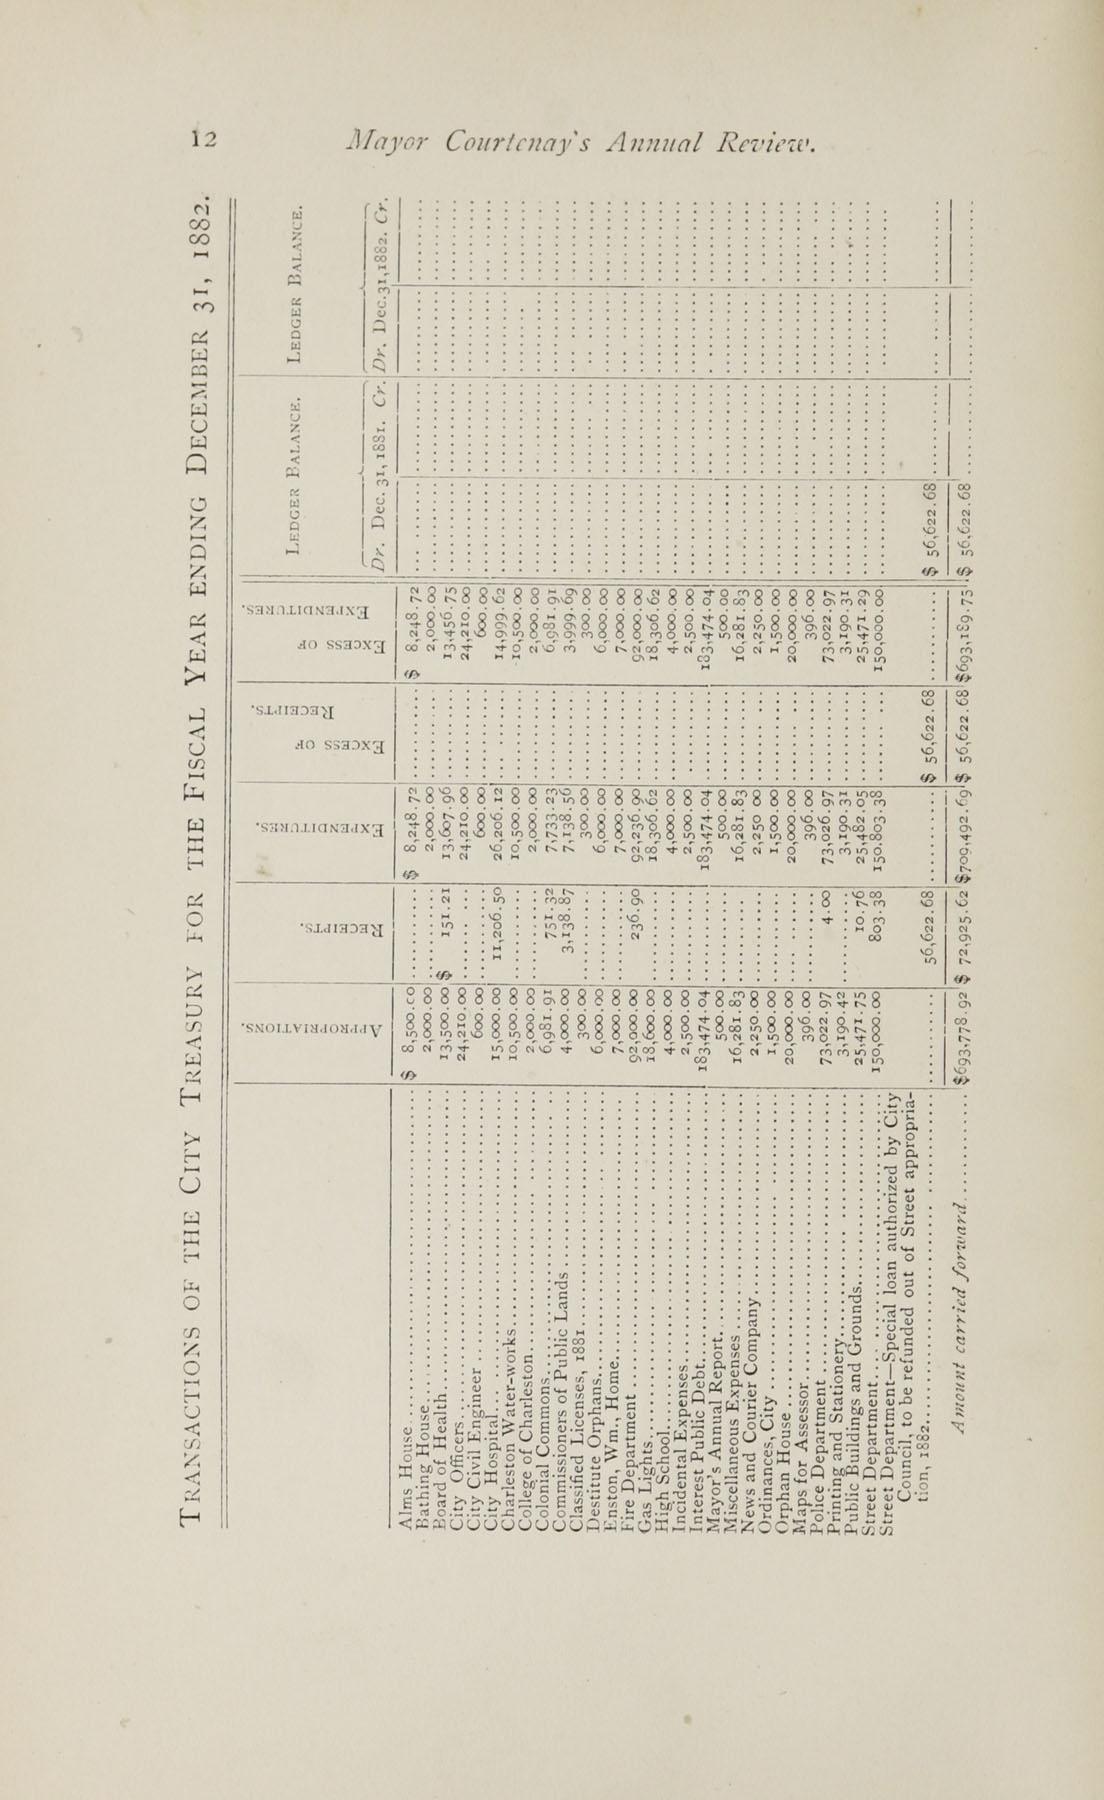 Charleston Yearbook, 1882, page 12